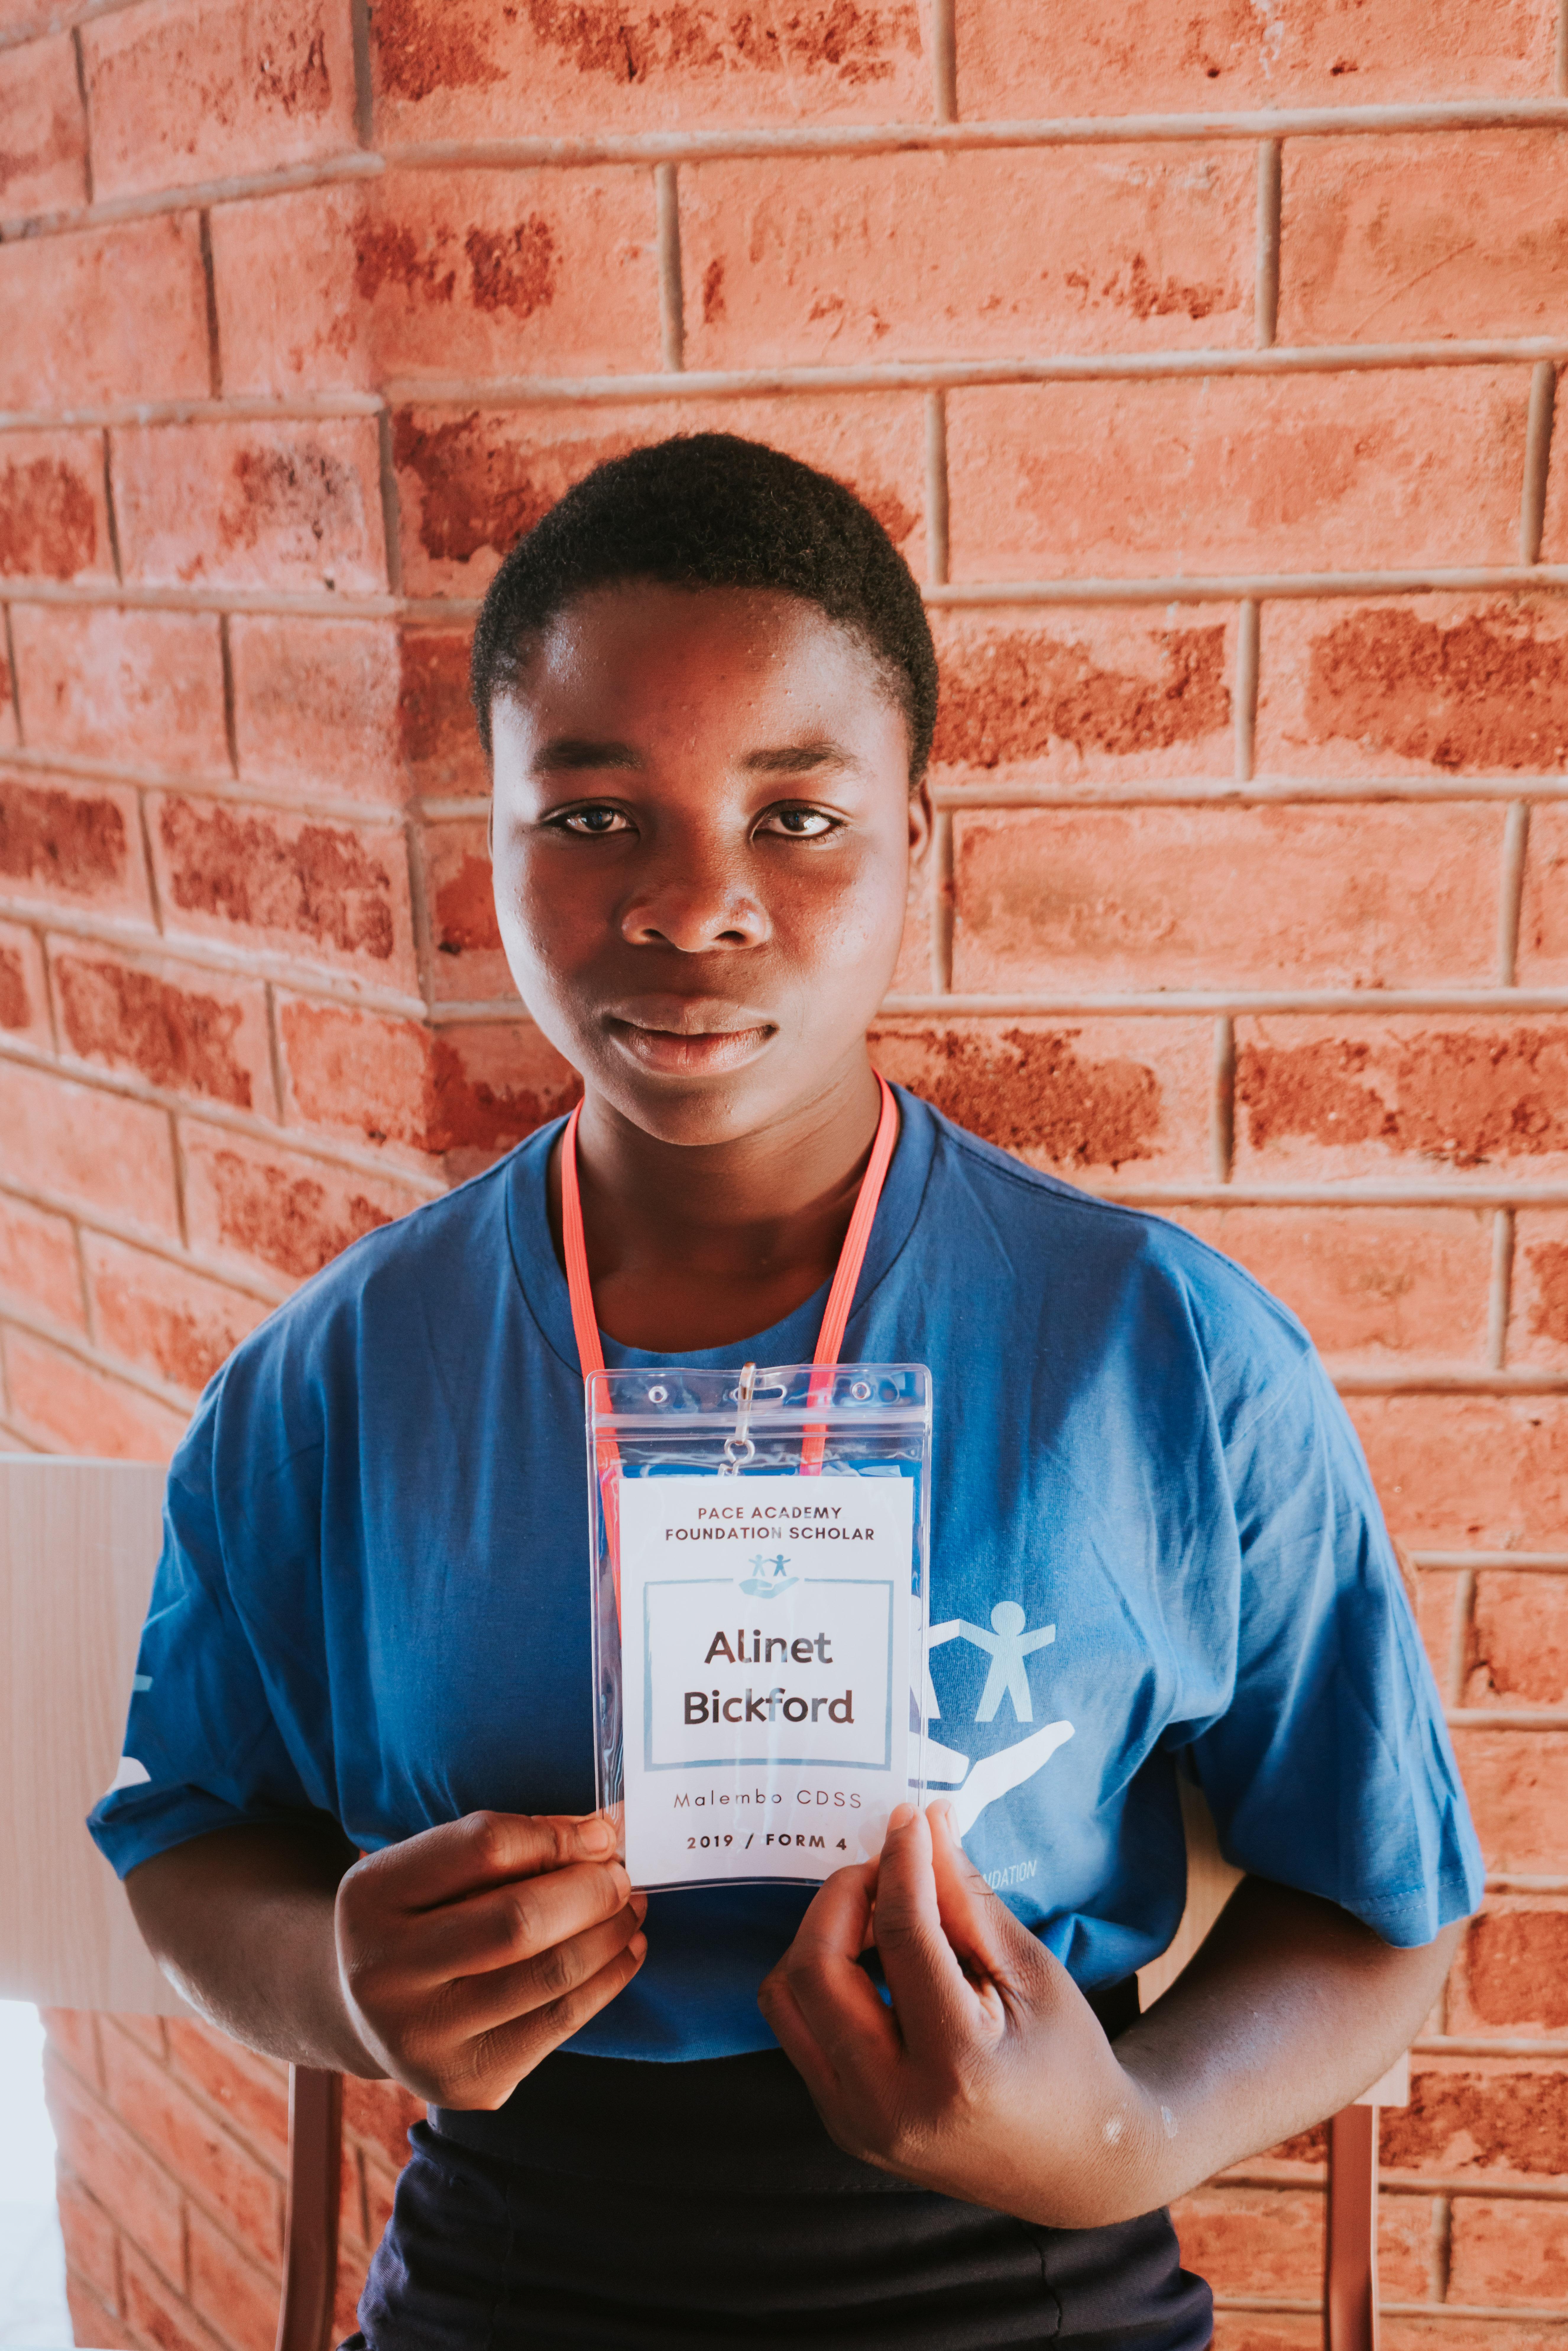 Alinet Bickford (Malembo CDSS)